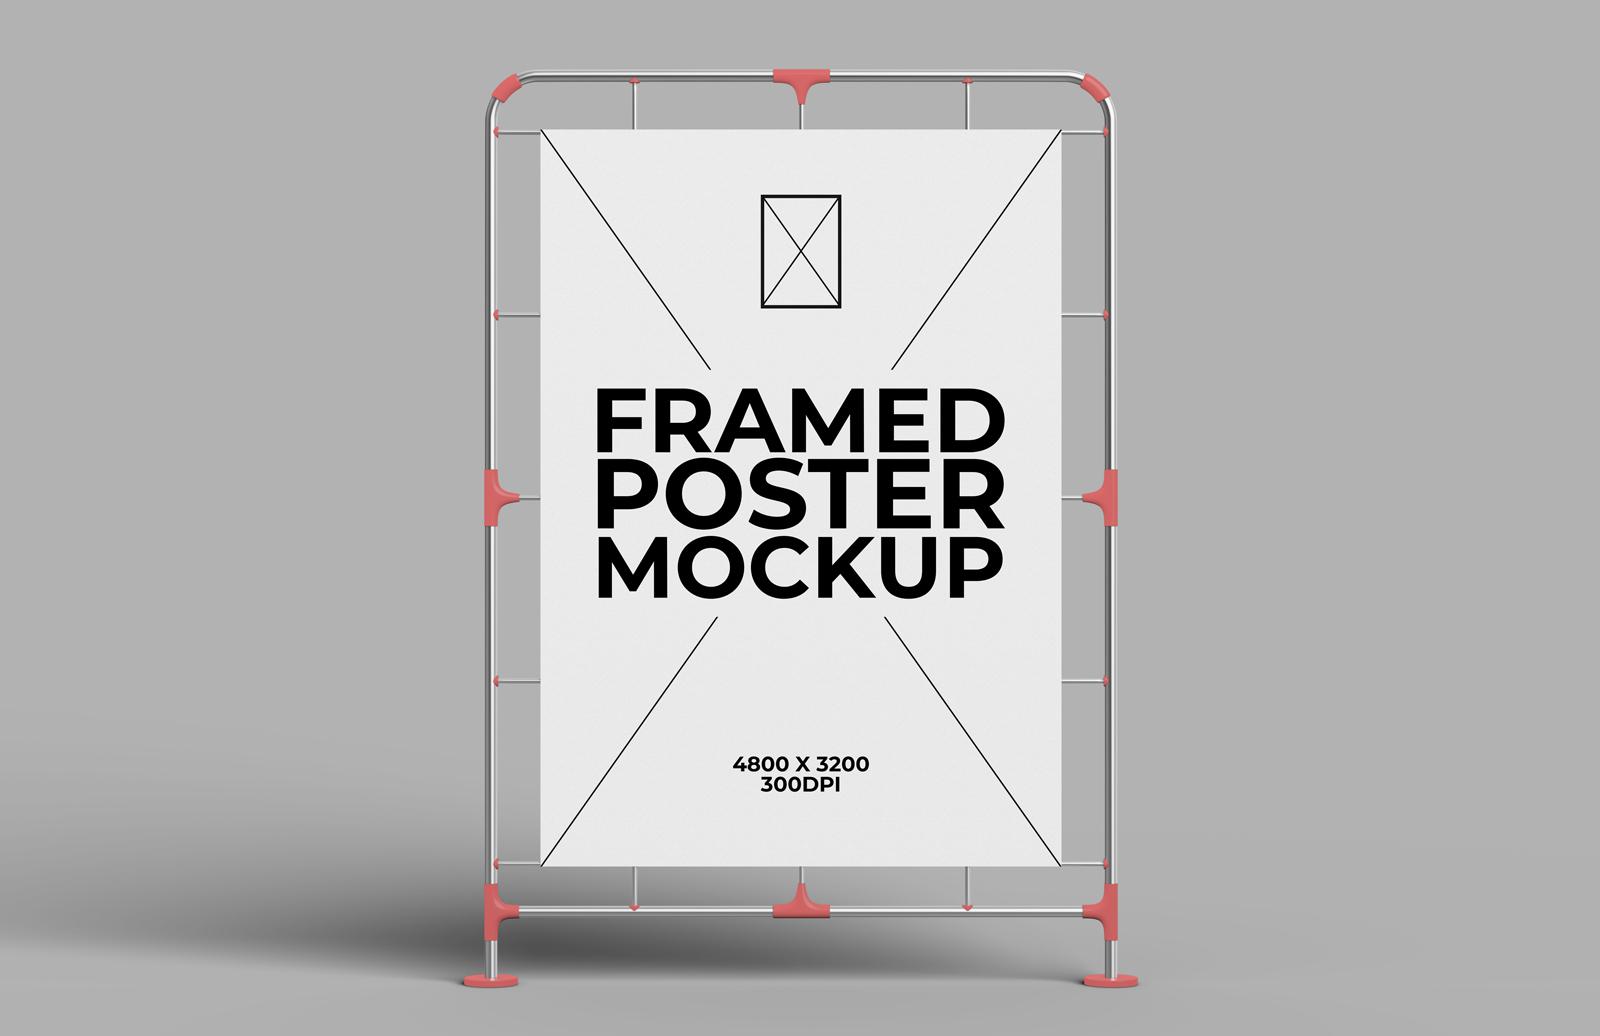 Framed Poster Mockup Preview 1